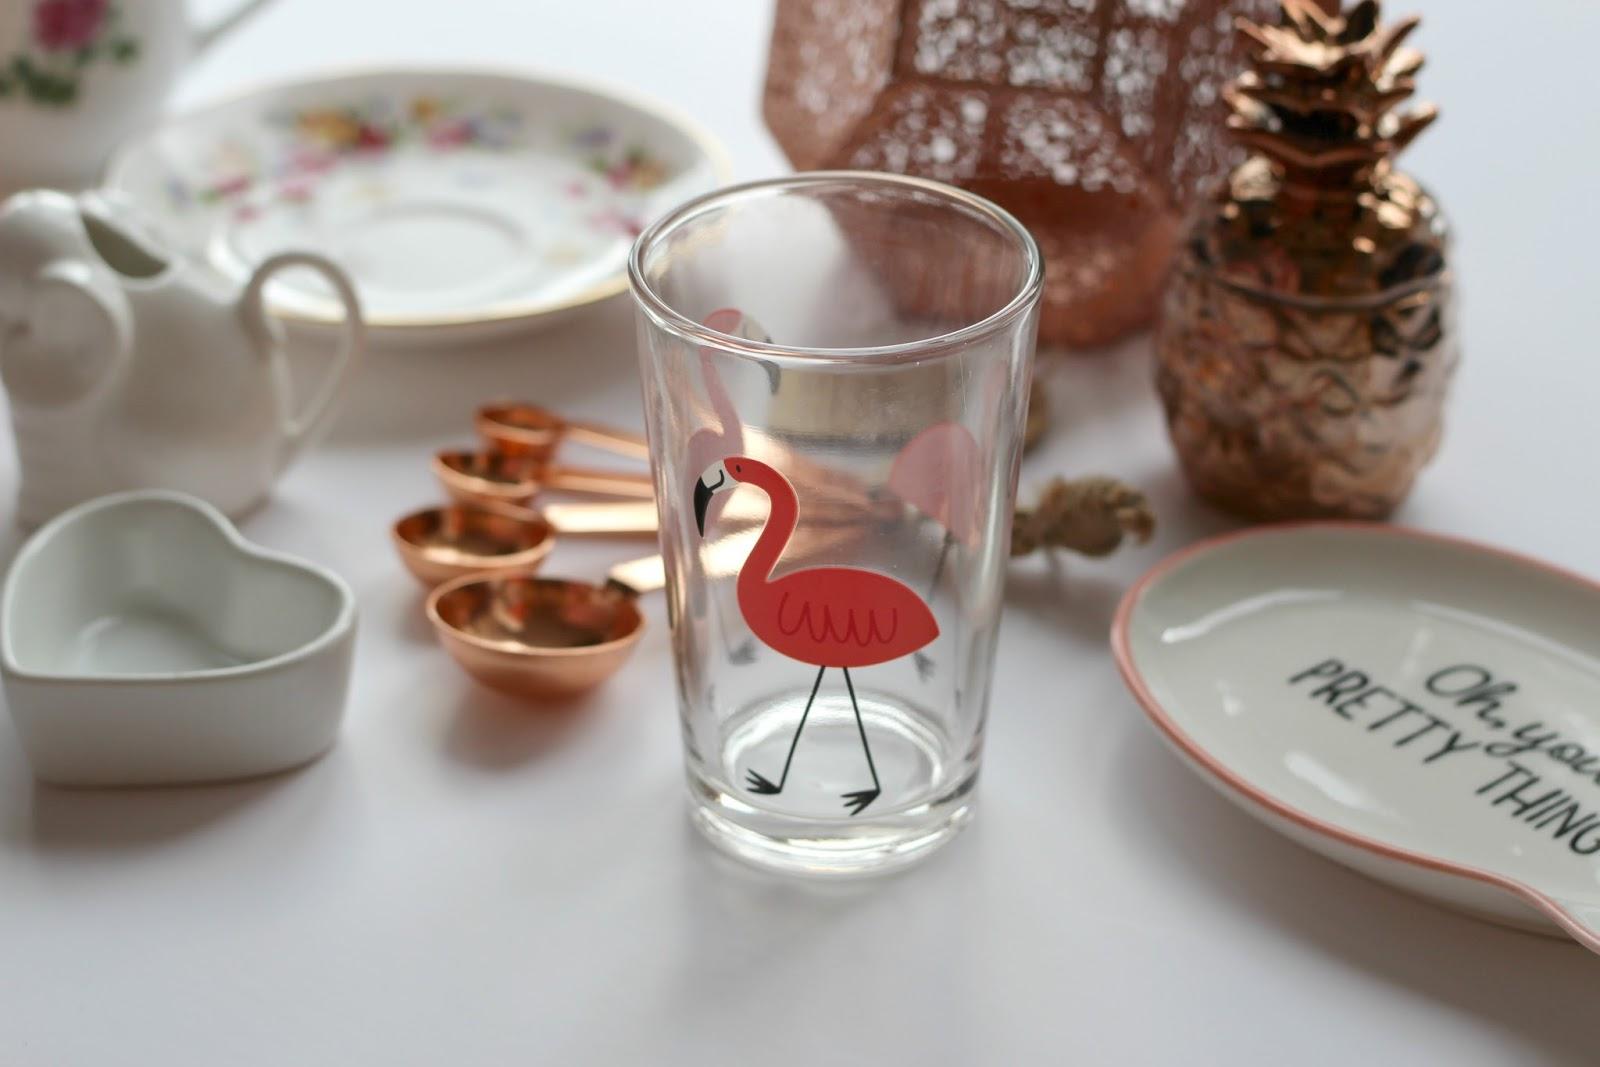 copper-measuring-spoons